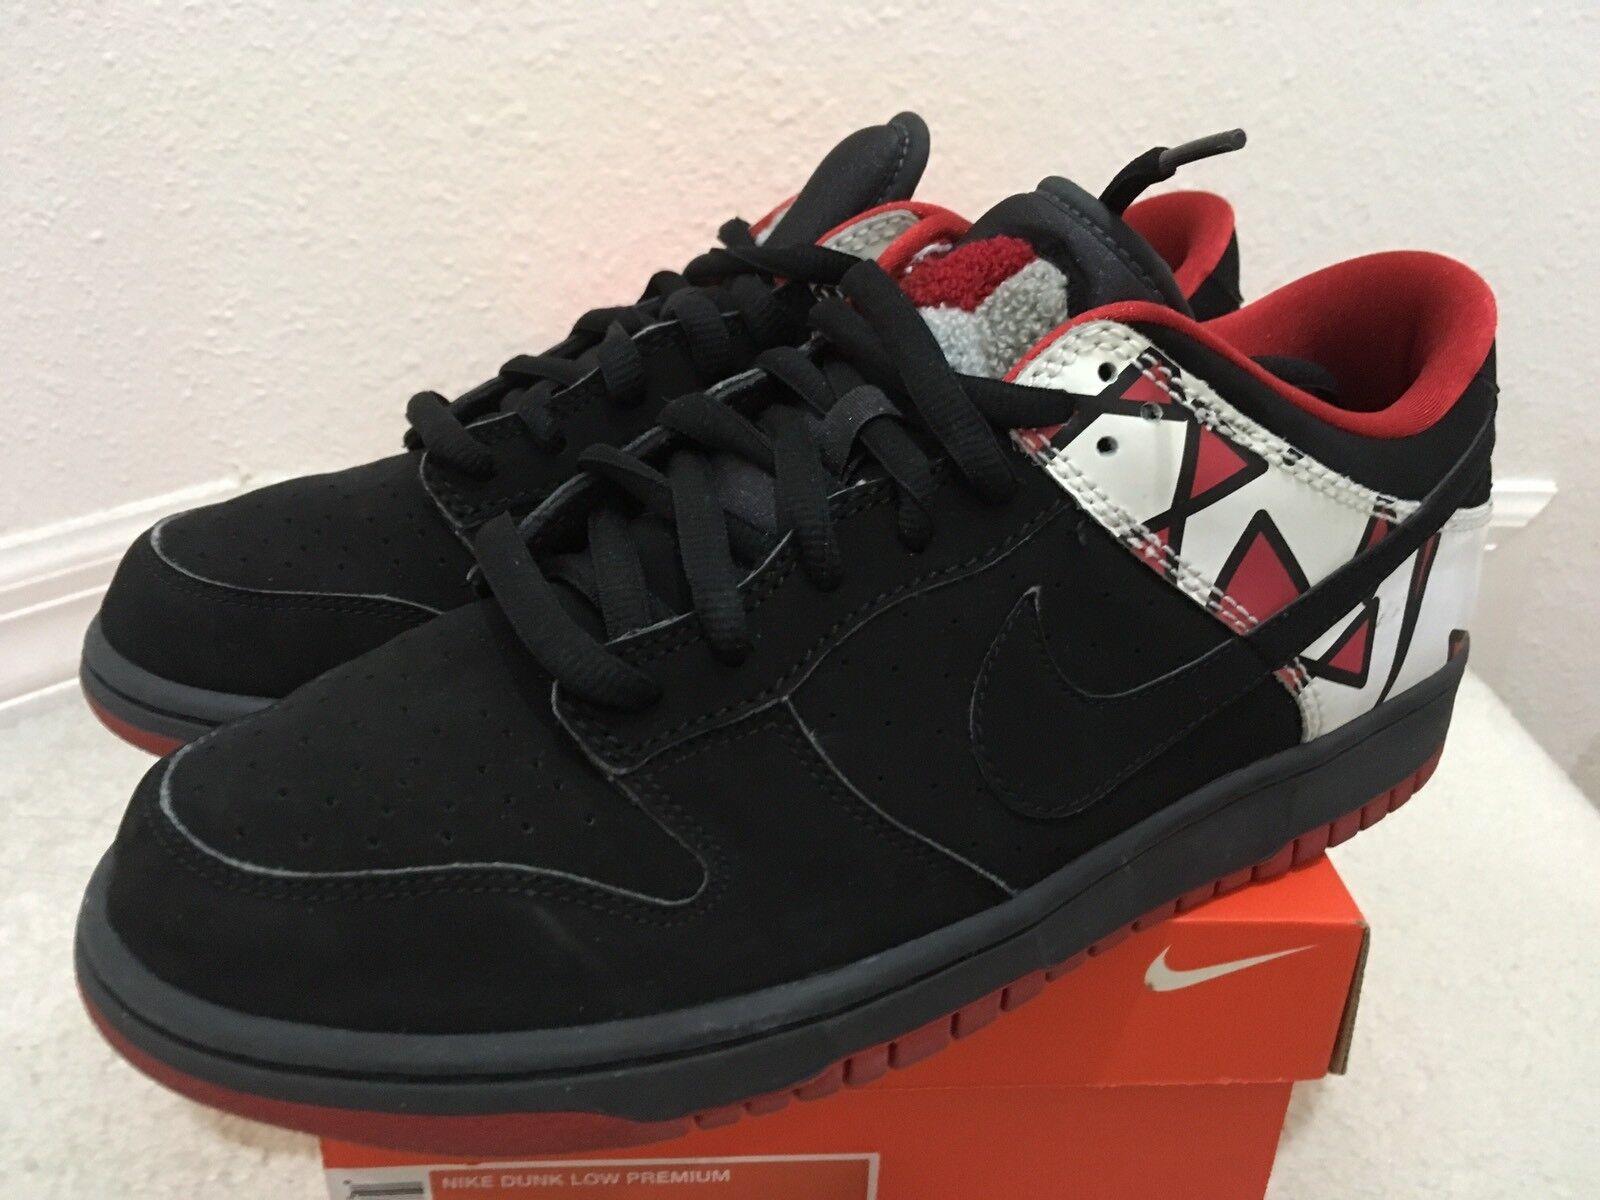 Nike Dunk Low Premium Jordan VIII 8 Black/Black-Anthracite Sz 9.5 307696-002